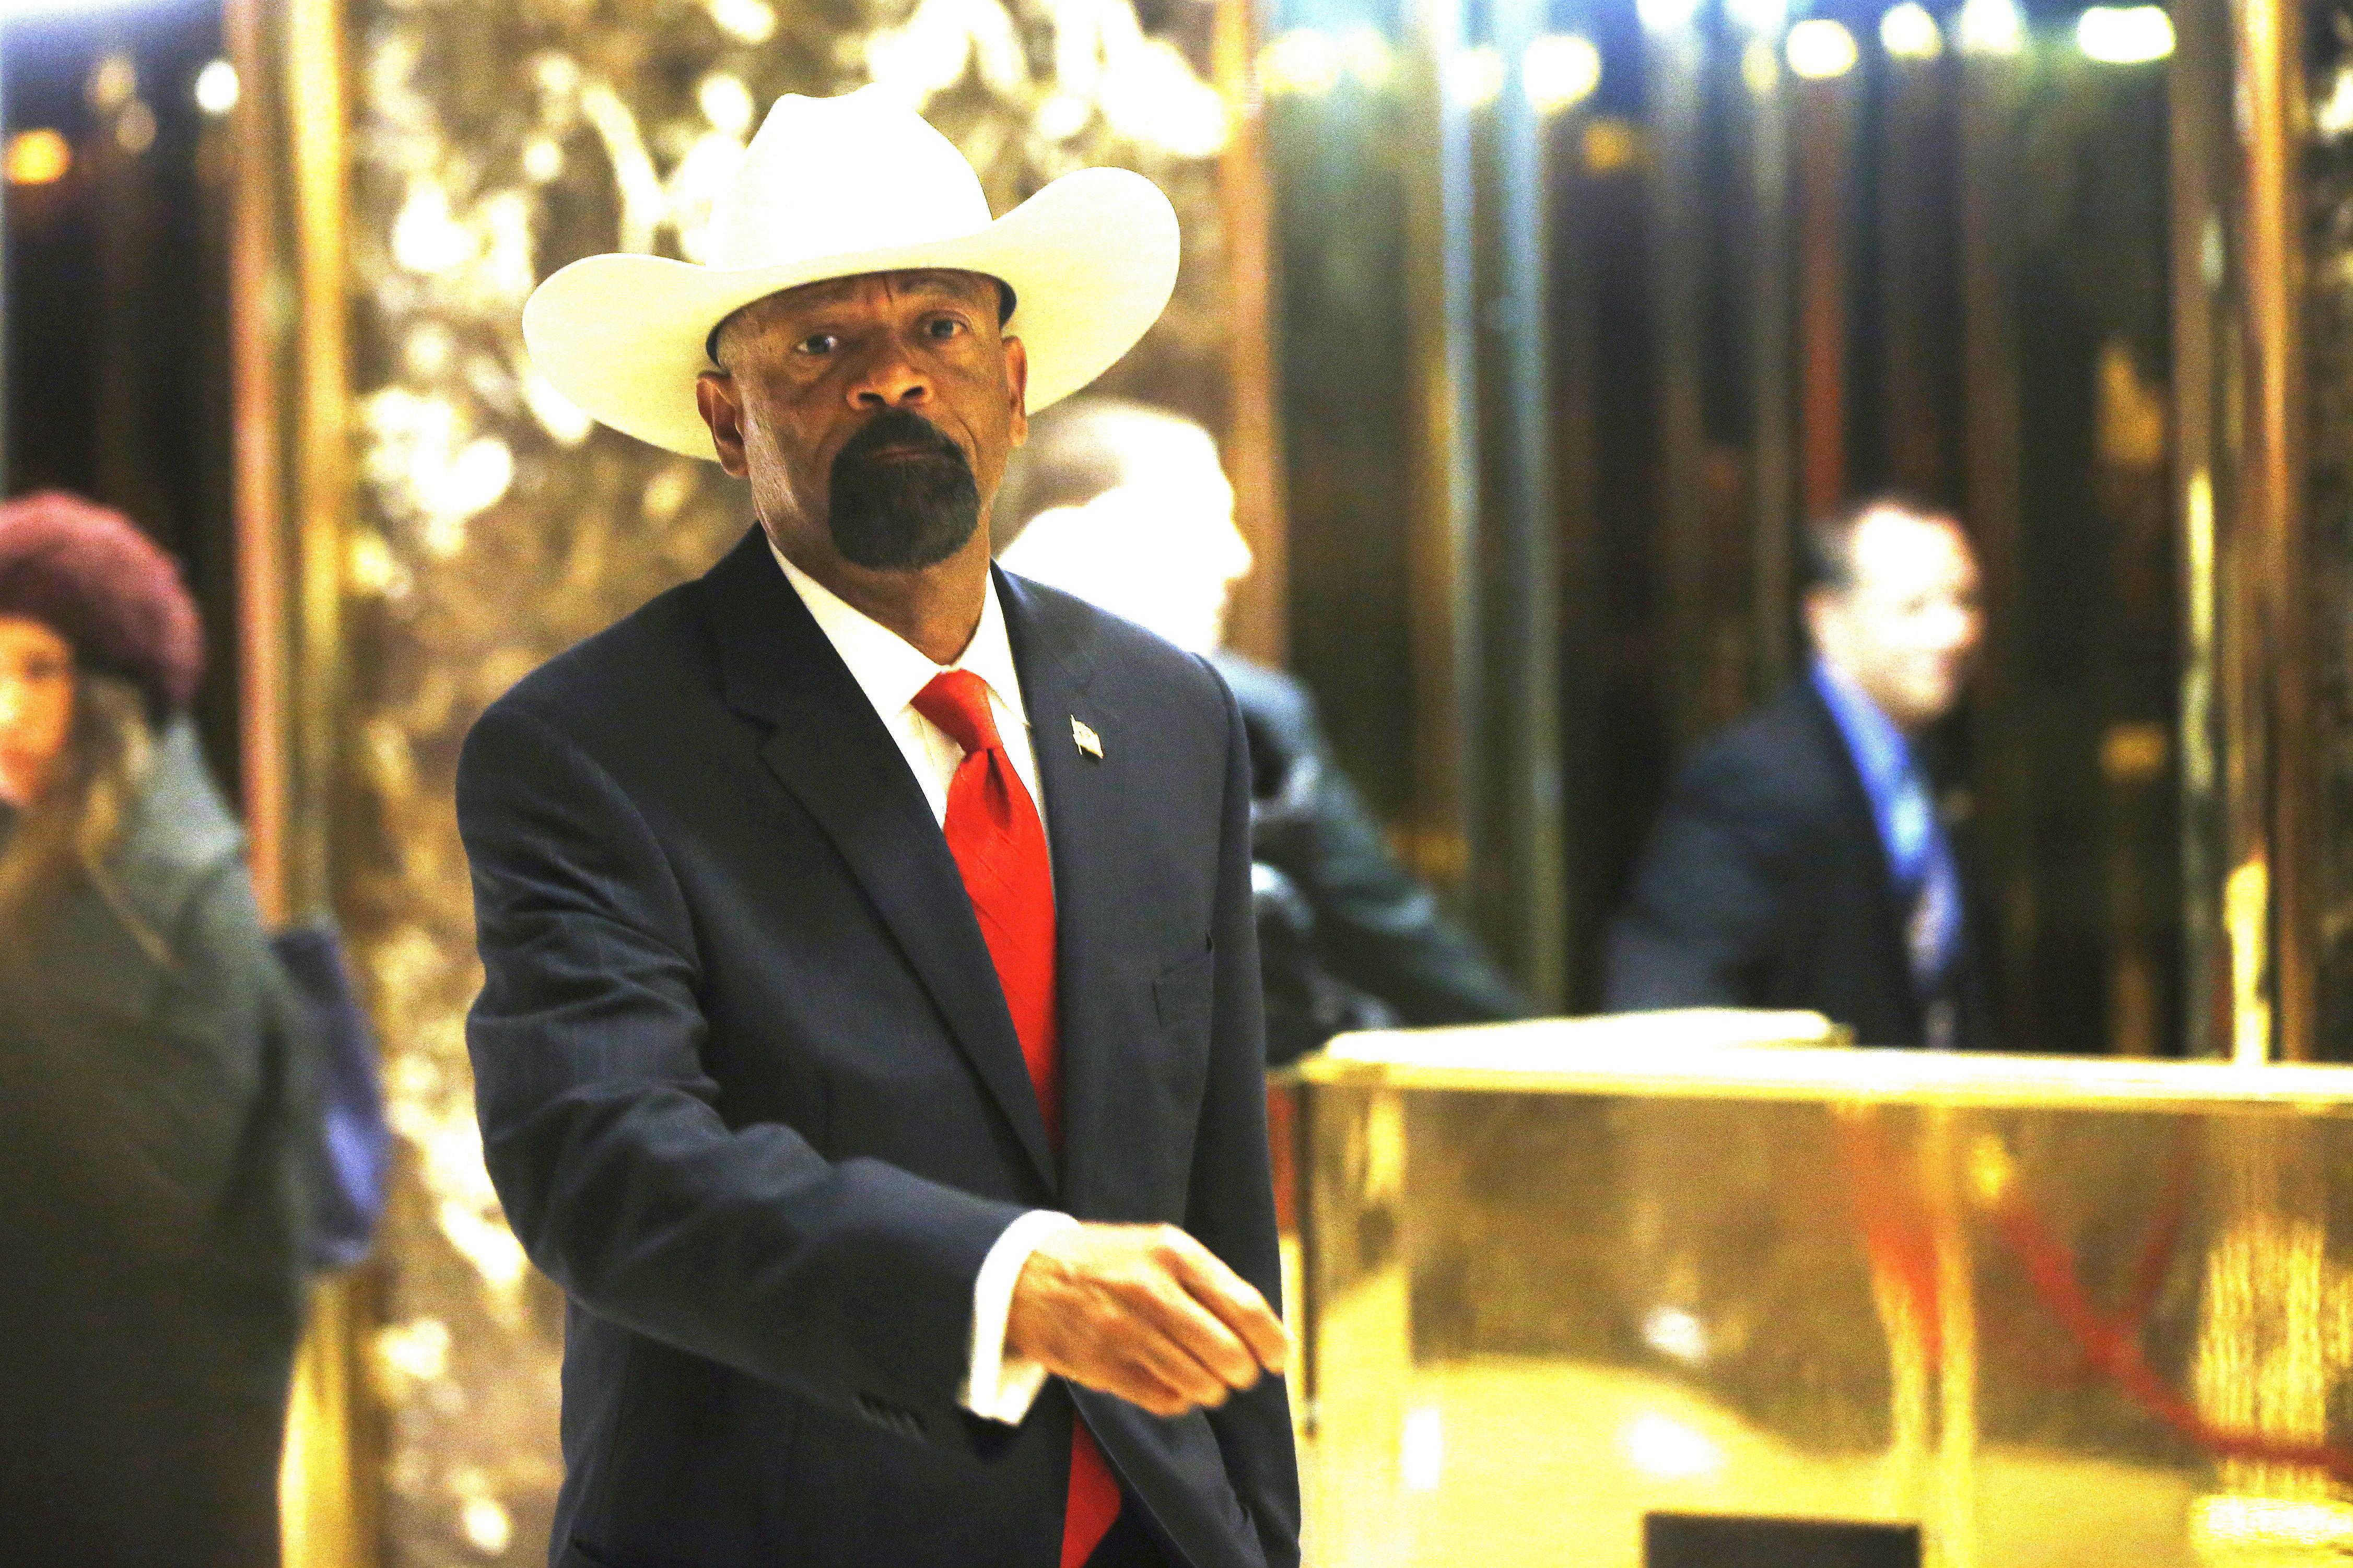 Former sheriff David Clarke